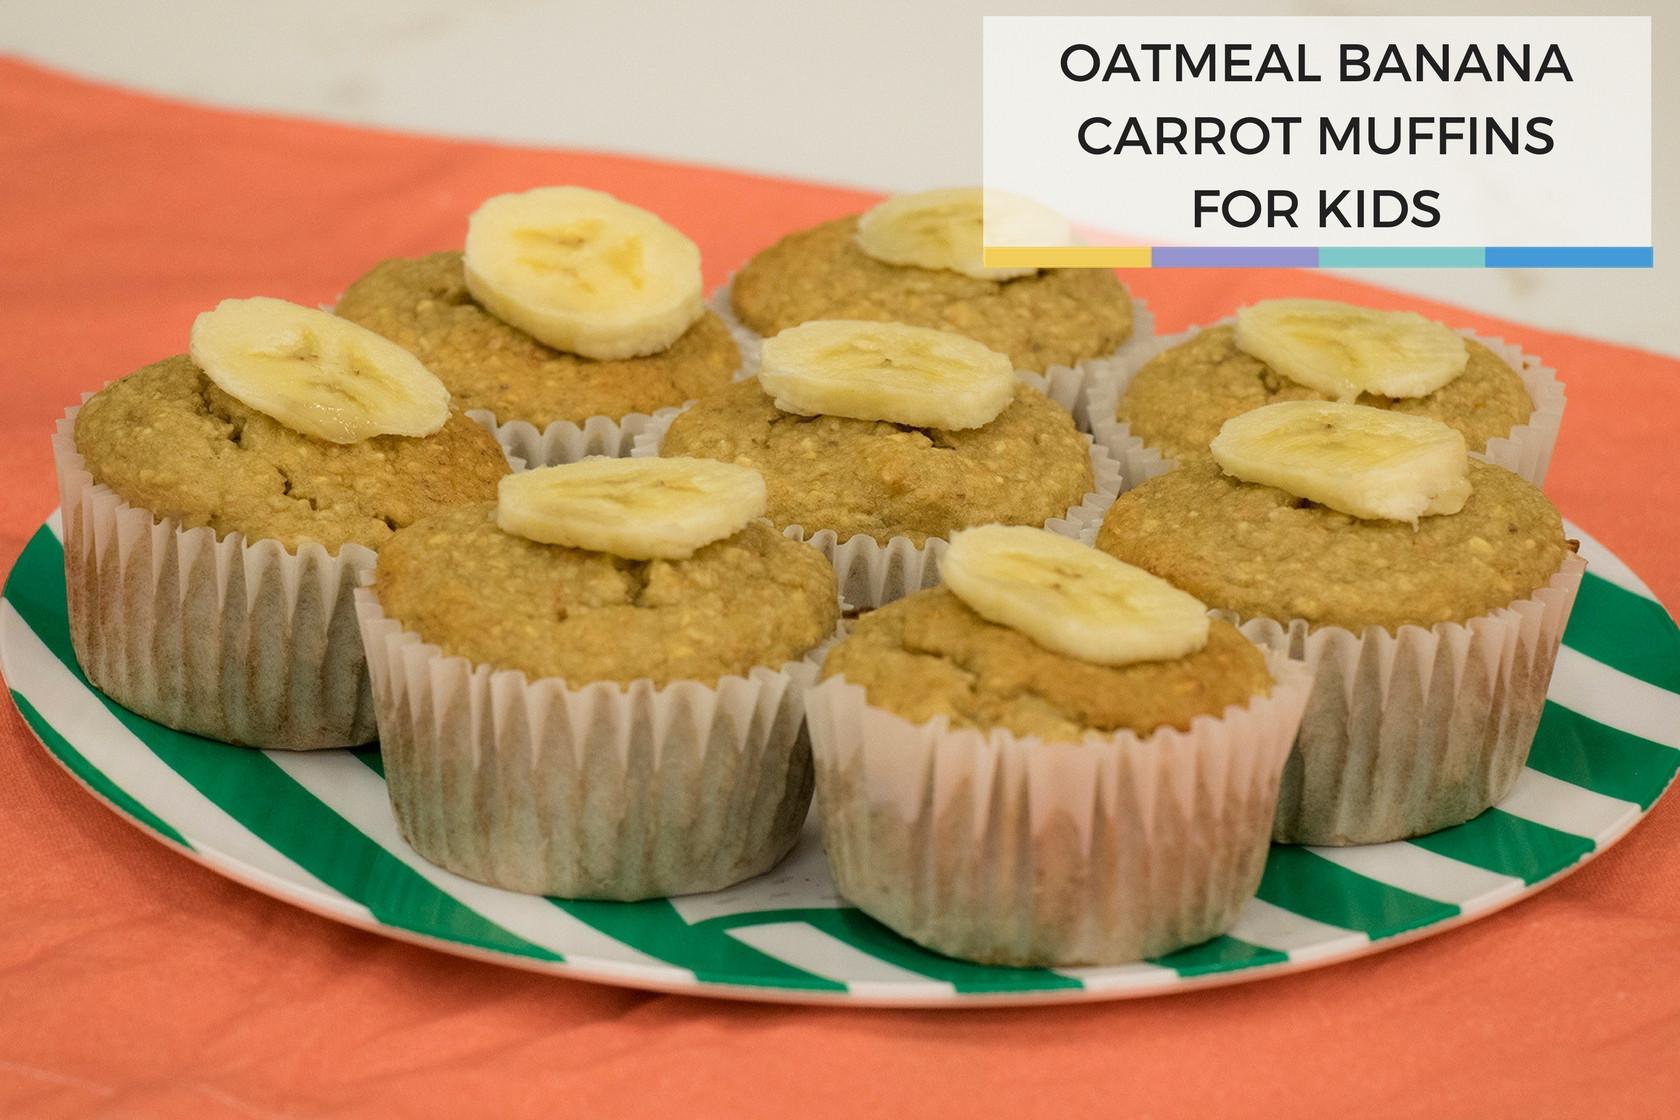 Healthy Breakfast Muffins For Kids  Healthy Kids Breakfast Oatmeal Banana Carrot Muffins